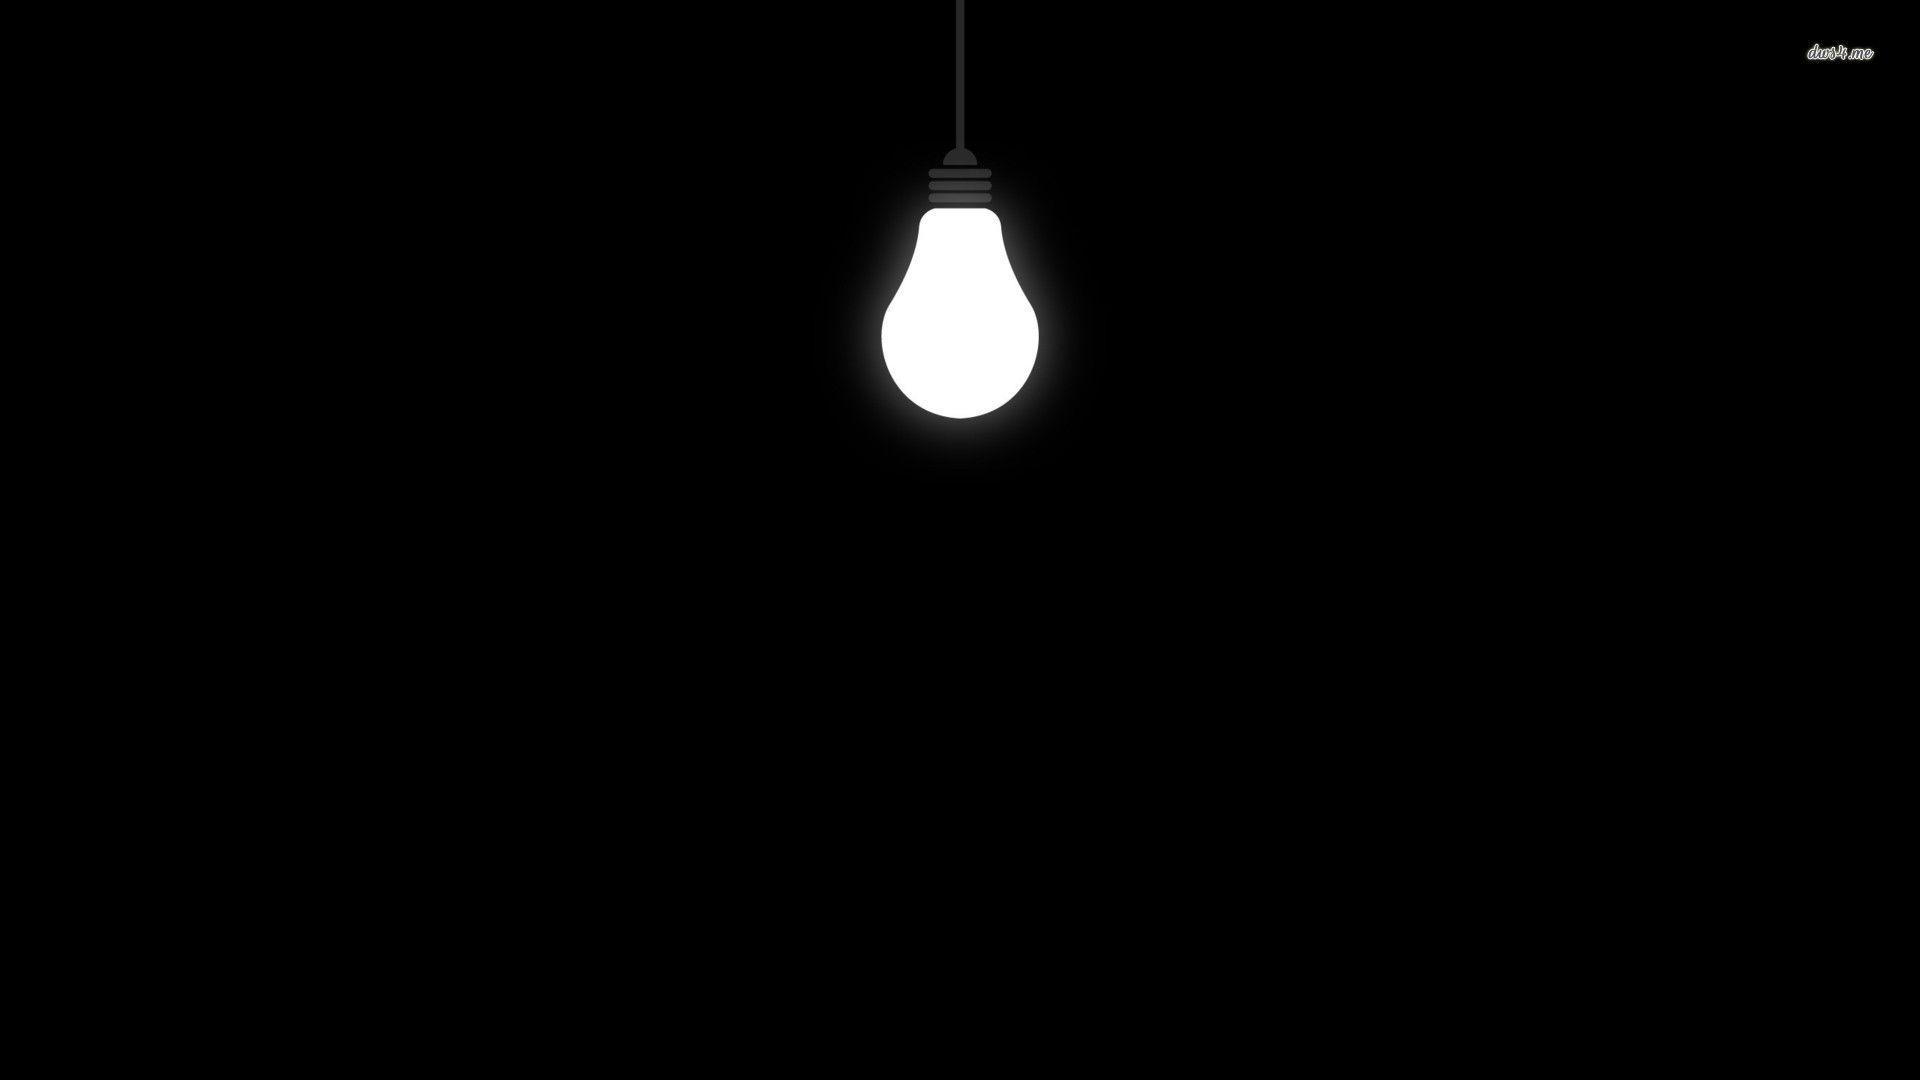 13414 Light Bulb 1920 1080 Vector Wallpaper Wallpapers In 2019